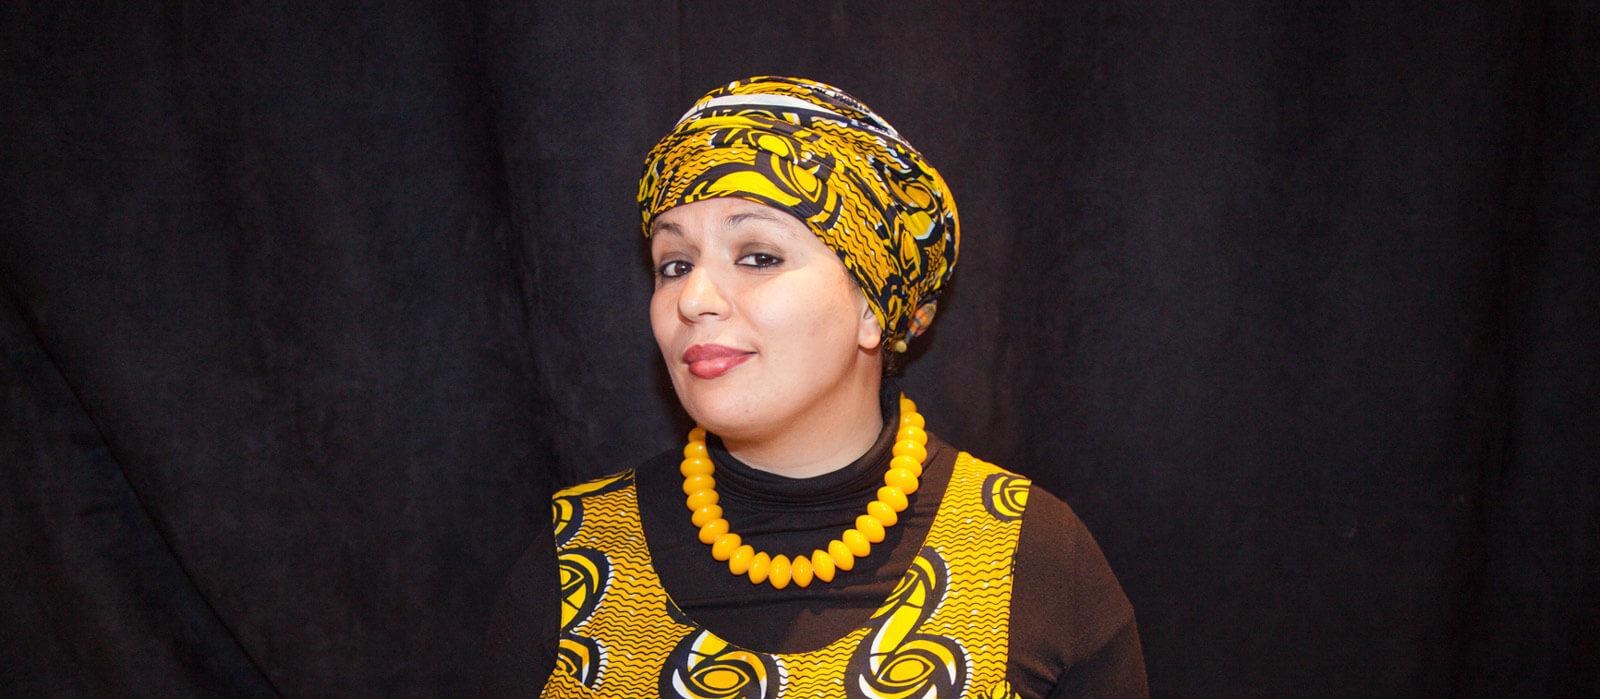 rencontre femme africaine au maroc Cayenne